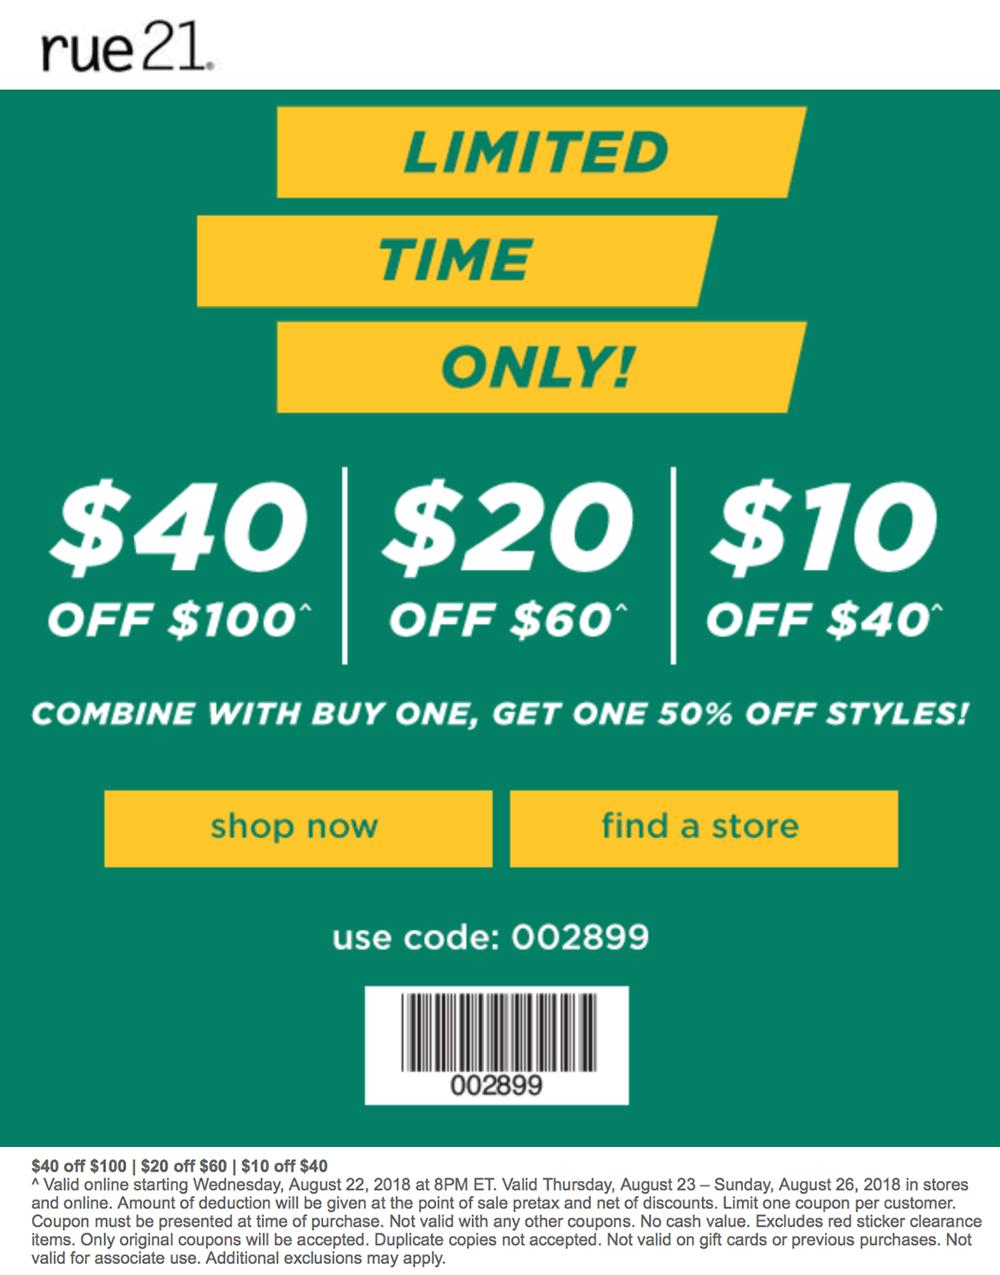 Rue21 Coupon November 2019 $10 off $40 & more at rue21, or online via promo code 002899